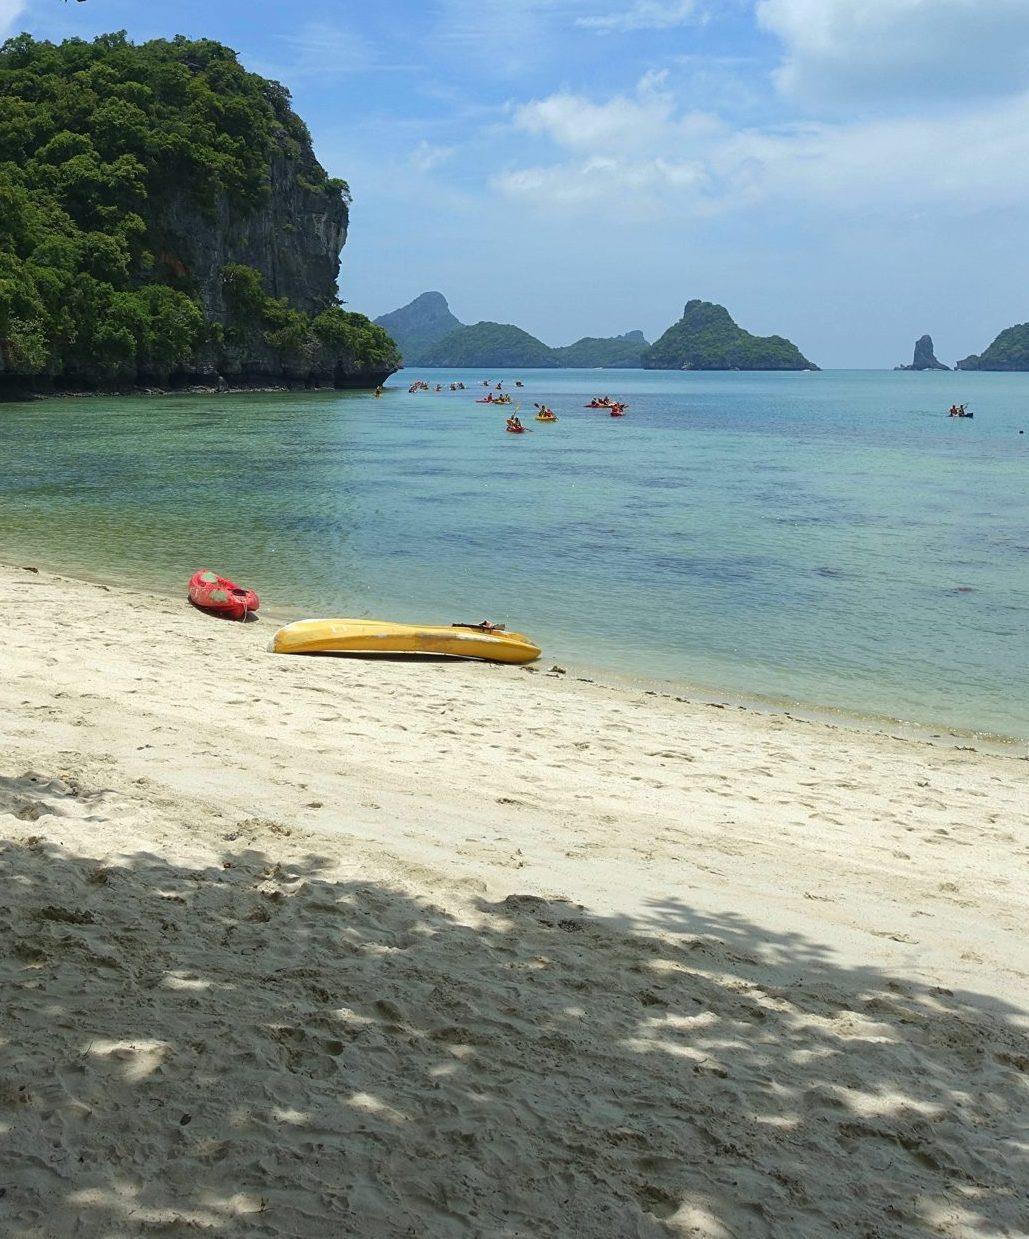 Paradise found - Angthong National Marine Park